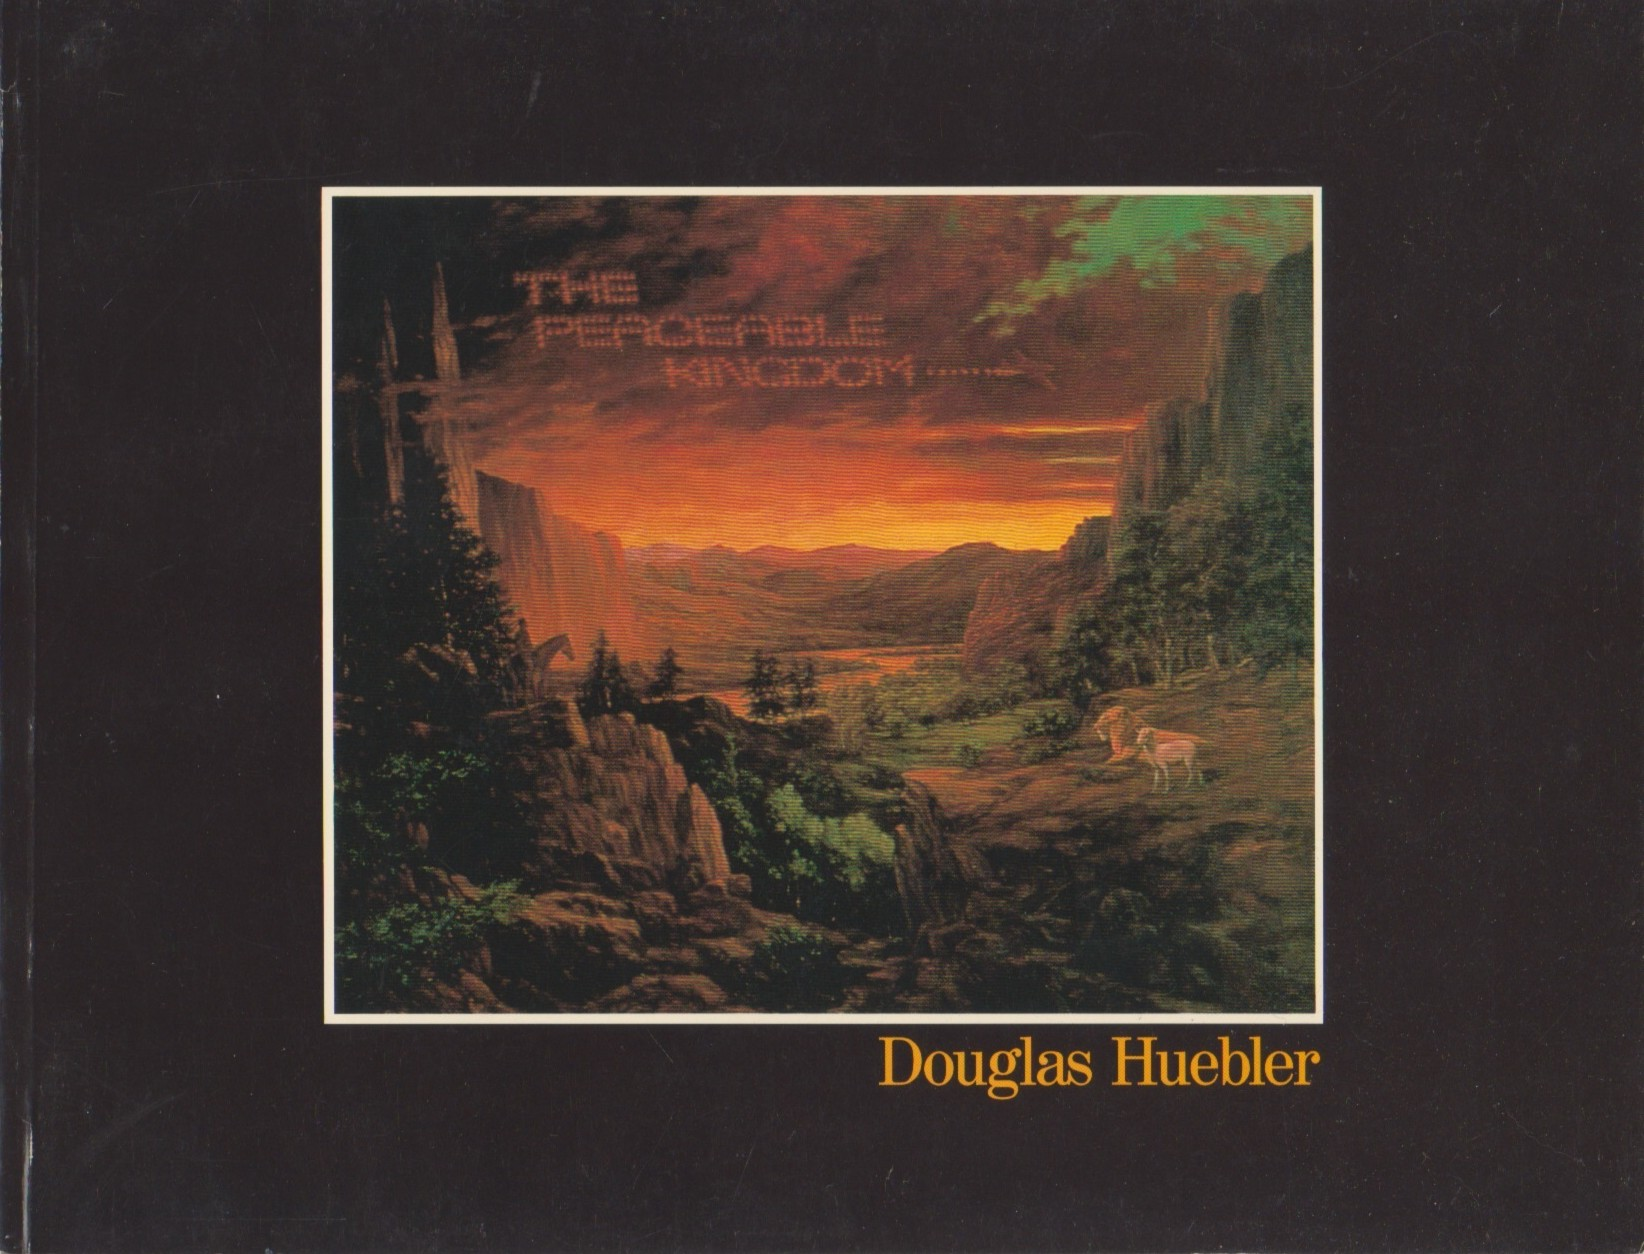 (HUEBLER, DOUGLAS). ONORATO, RONALD J. - DOUGLAS HUEBLER